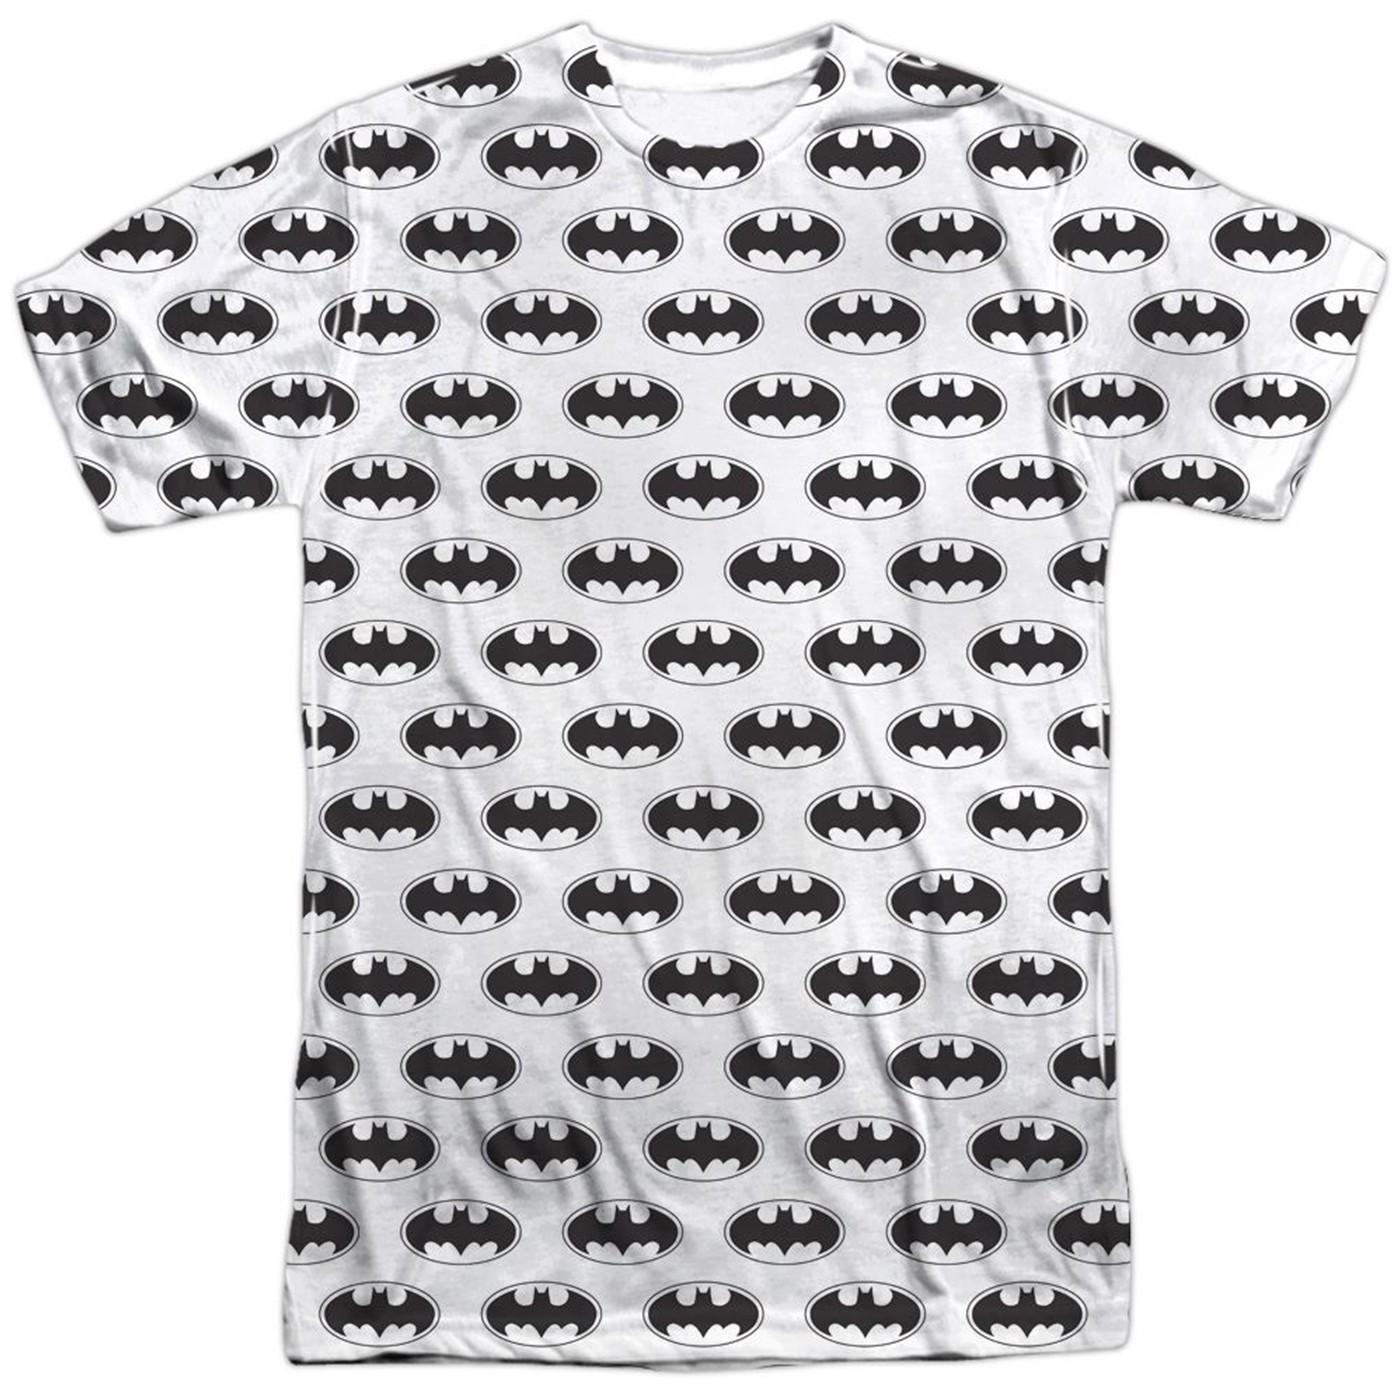 Batman All Over Print Sublimated Men's T-Shirt